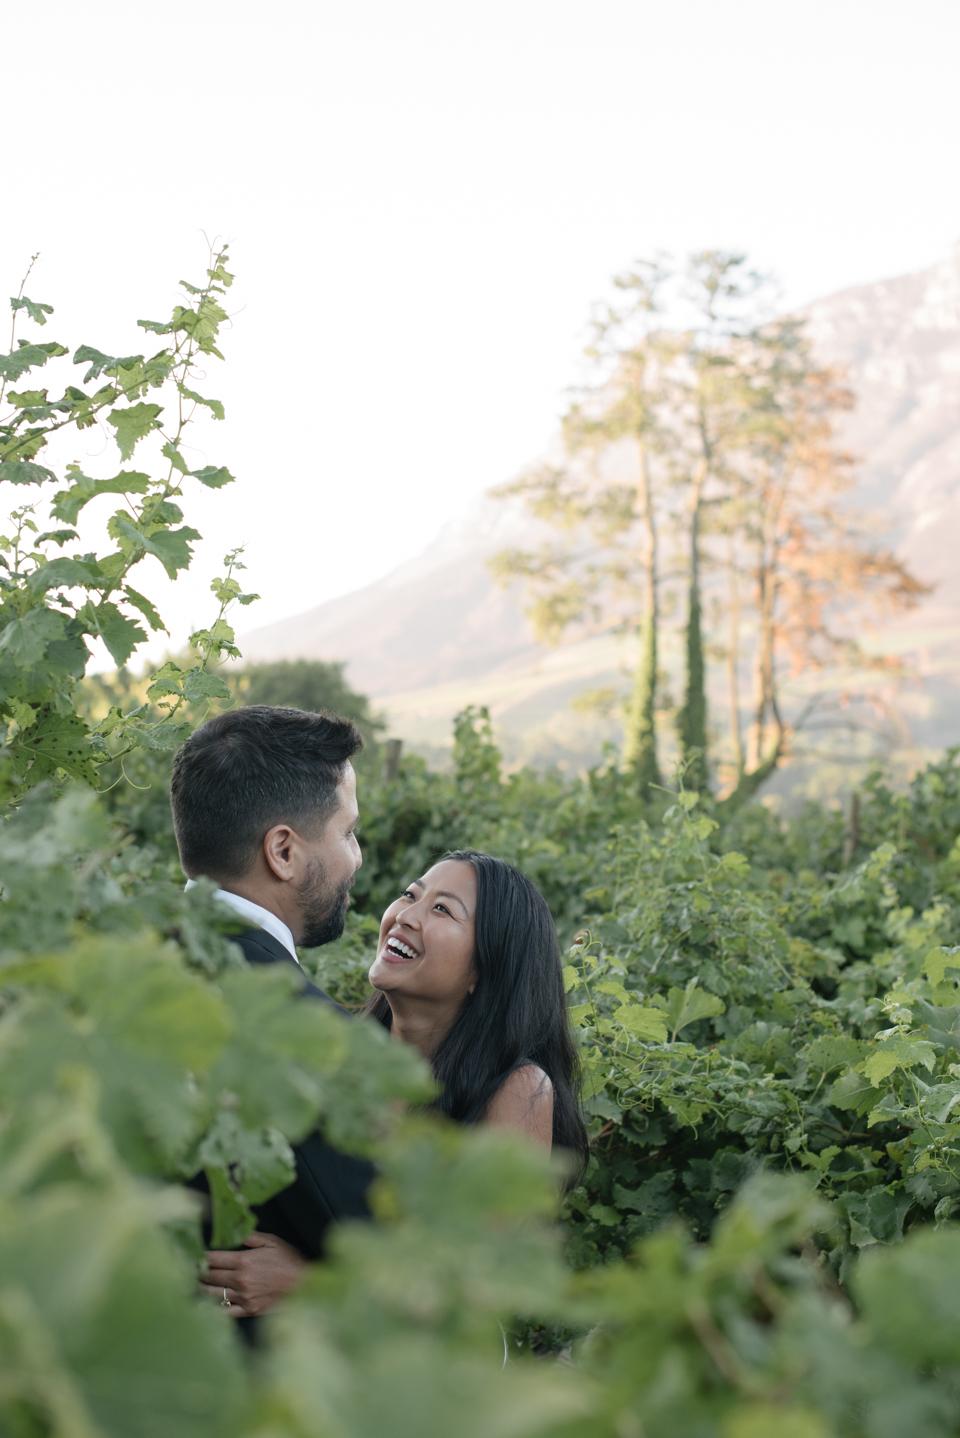 Grace and Alfonso wedding Clouds Estate Stellenbosch South Africa shot by dna photographers 731.jpg